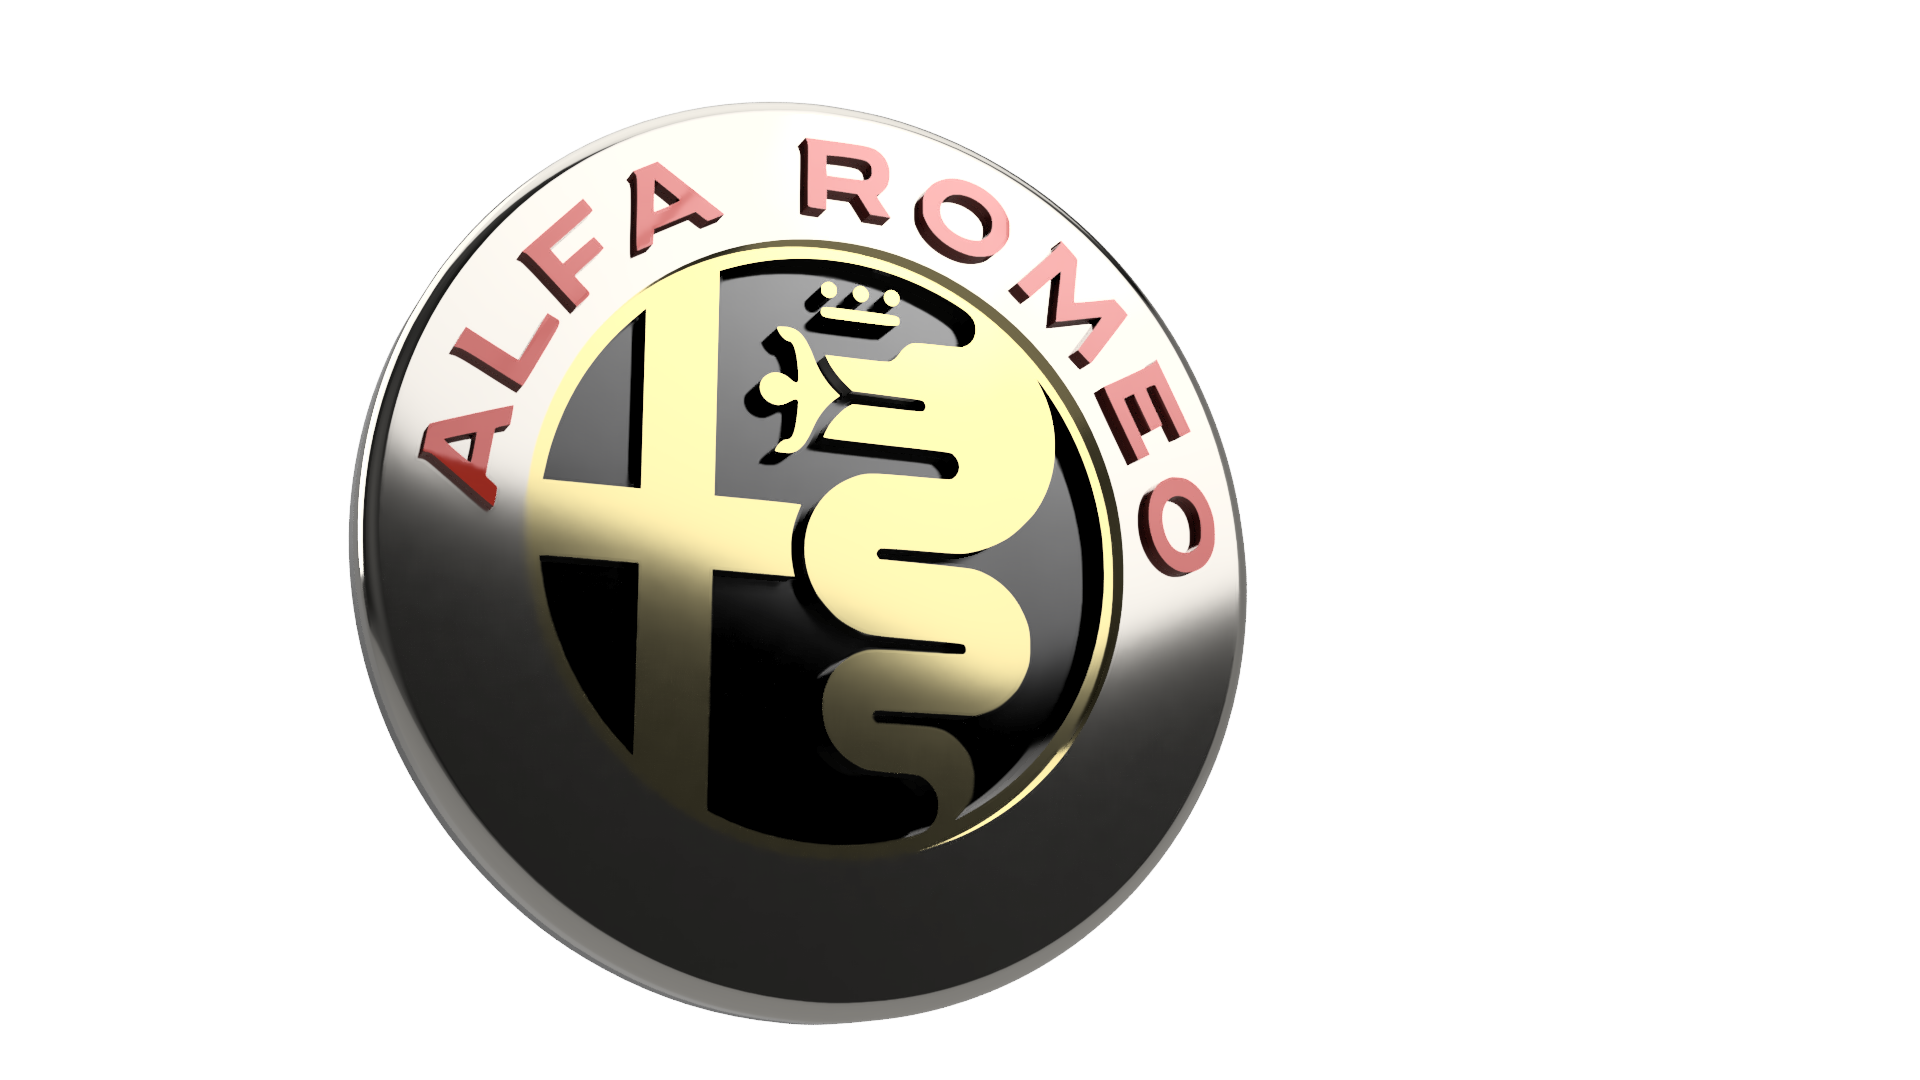 Alfa Romeo Logo By Djpac2pac Thingiverse Symbol Jun 1 2018 View Original